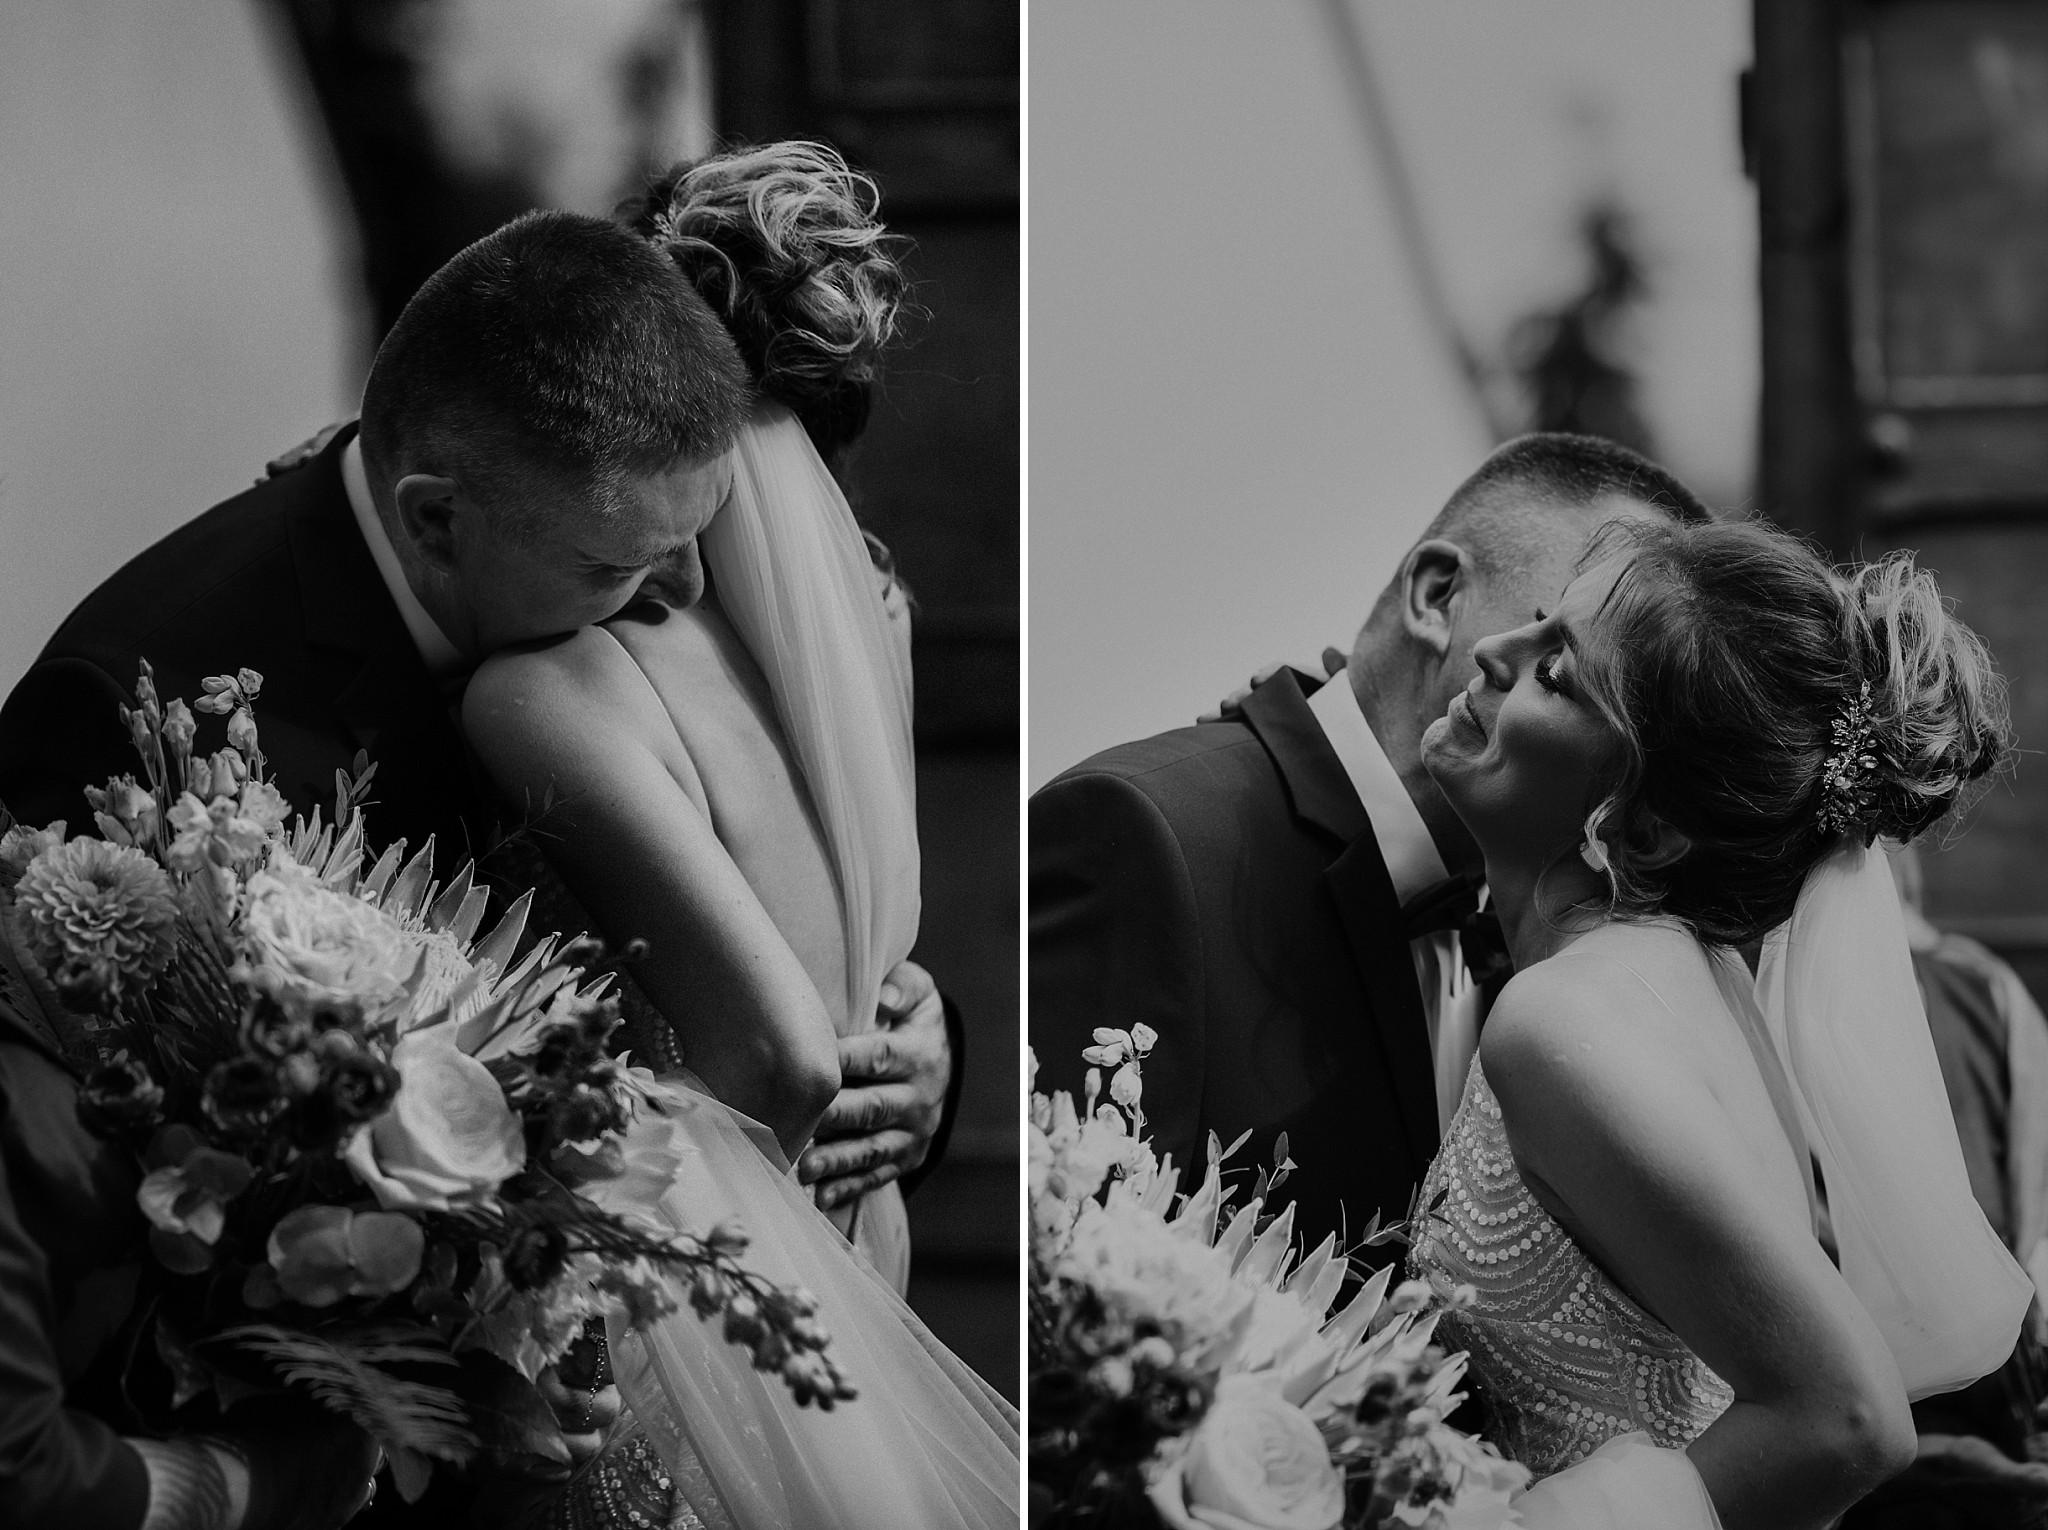 fotograf poznan wesele dobra truskawka piekne wesele pod poznaniem wesele w dobrej truskawce piekna para mloda slub marzen slub koronawirus slub listopad wesele koronawirus 100